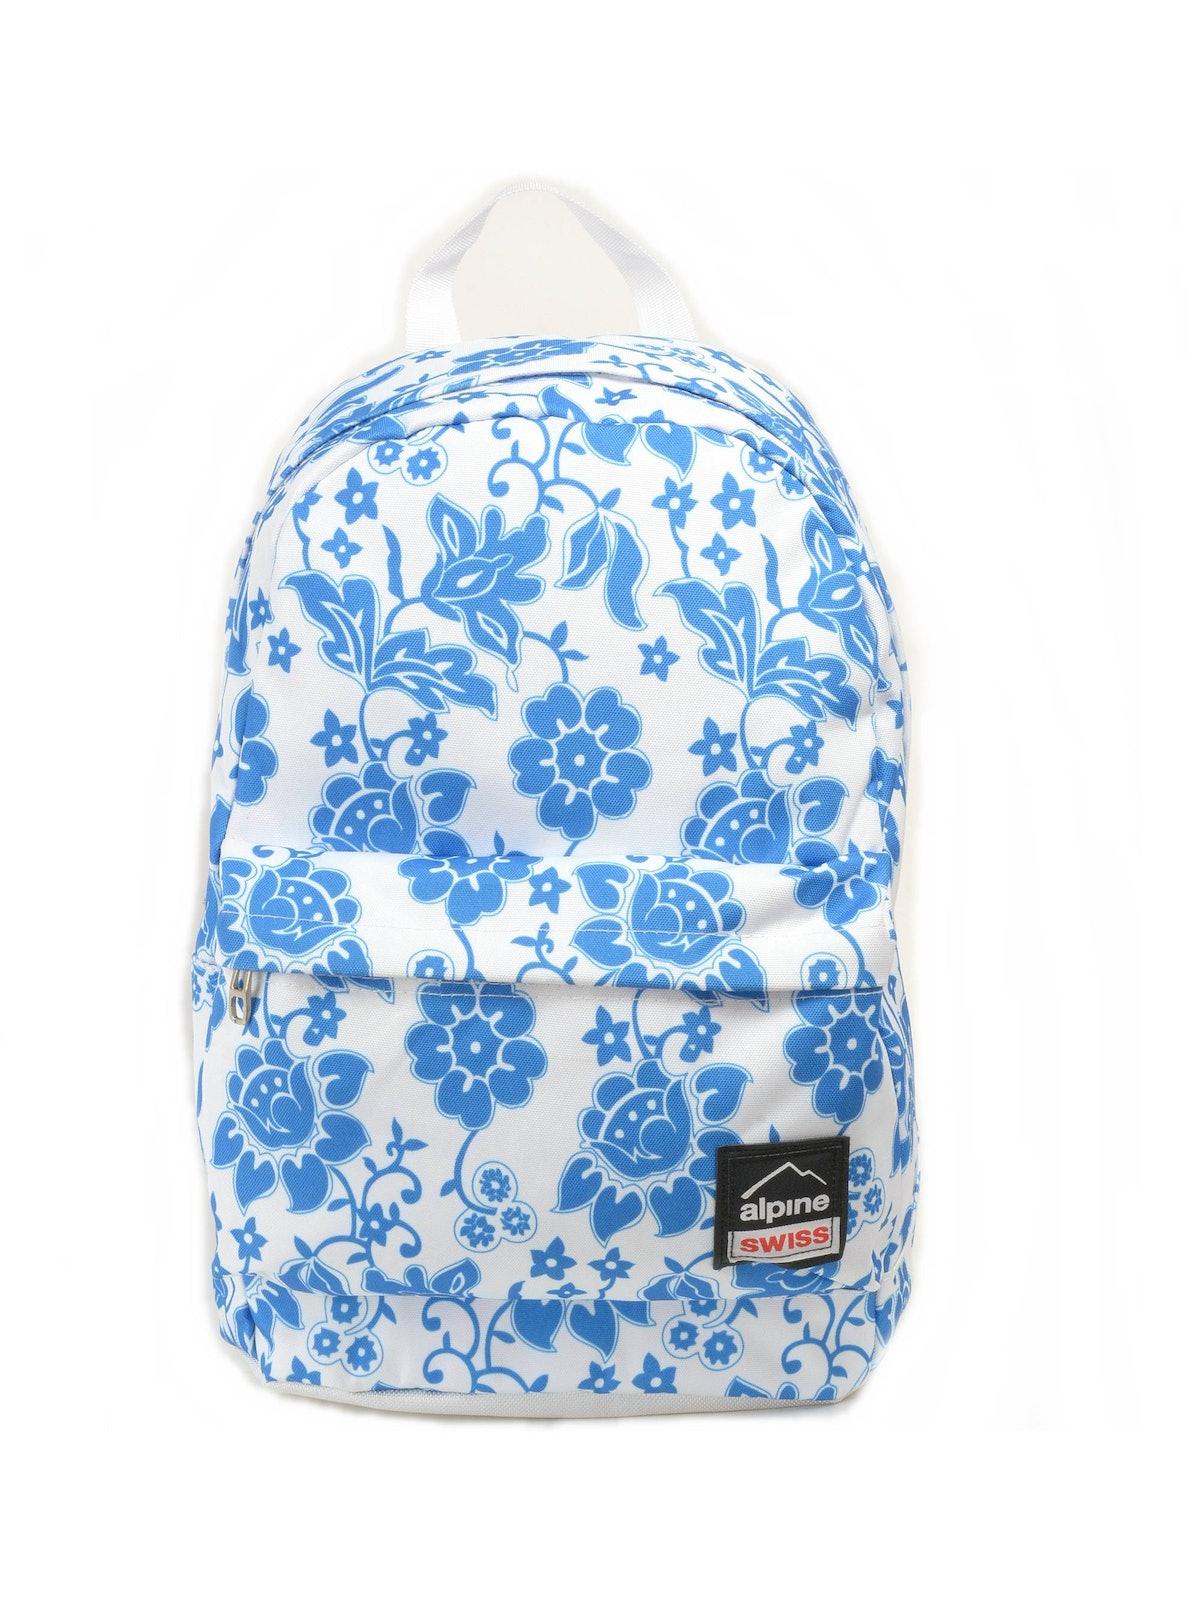 Midterm Backpack School Bag Bookbag Daypack 1